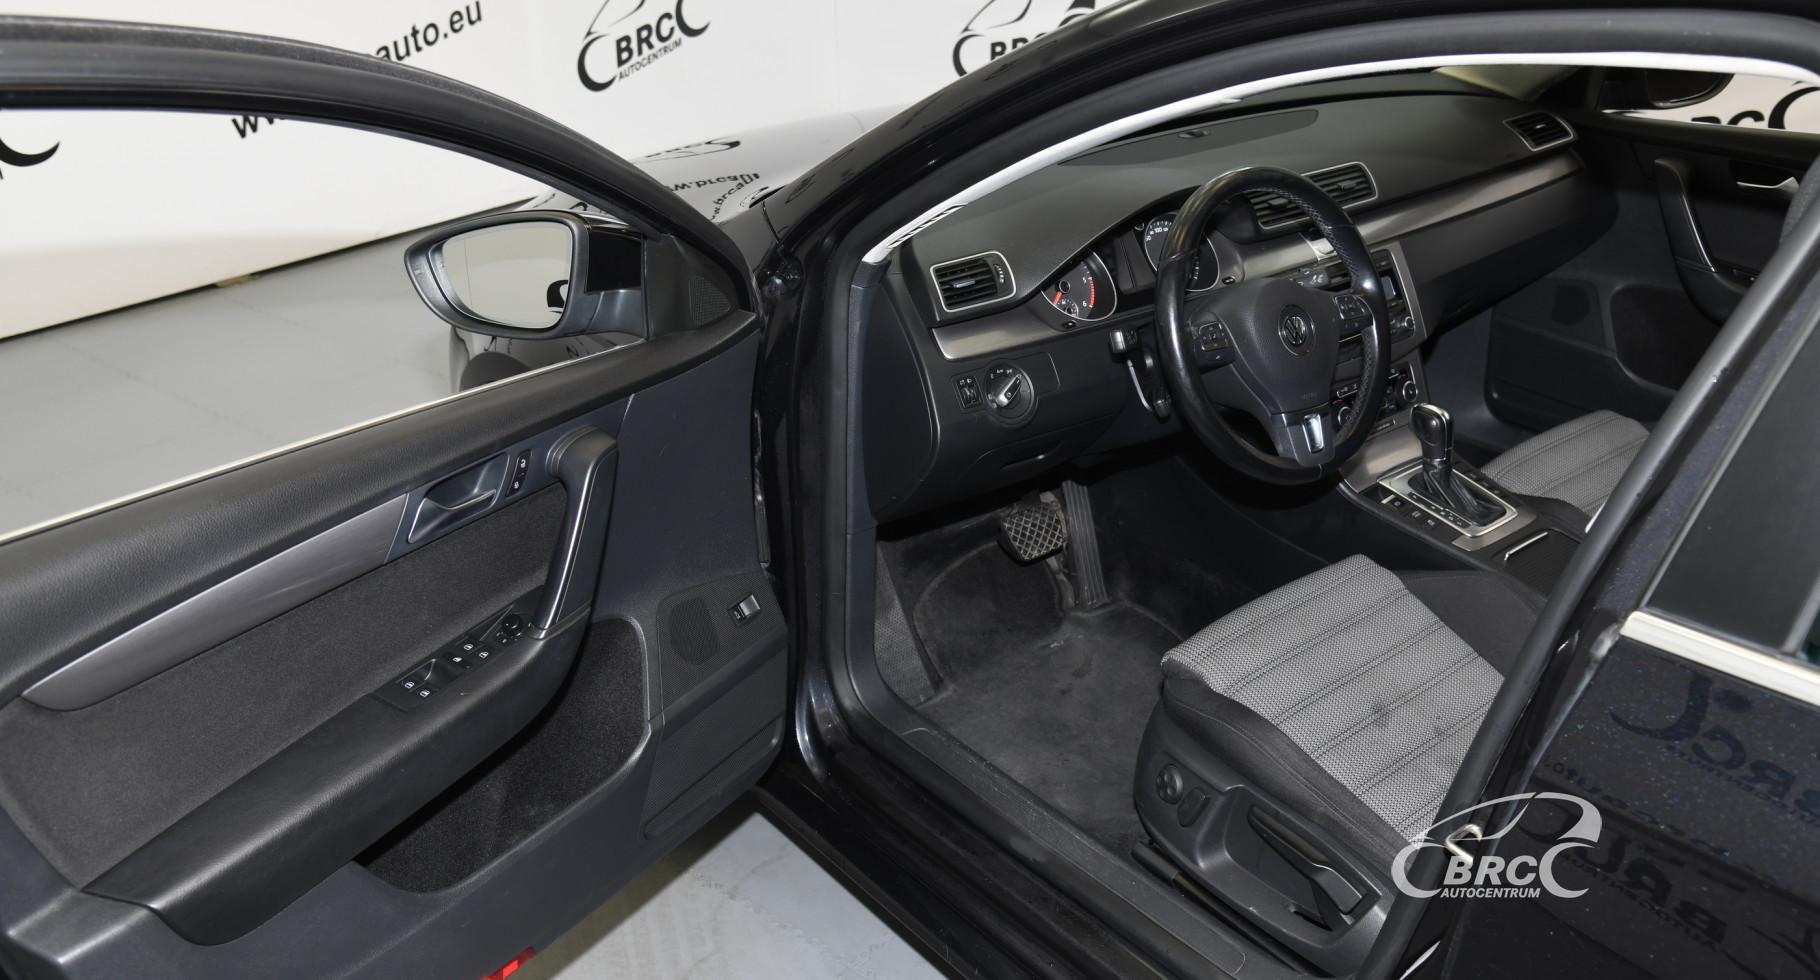 Volkswagen Passat 2.0 TDI Automatas